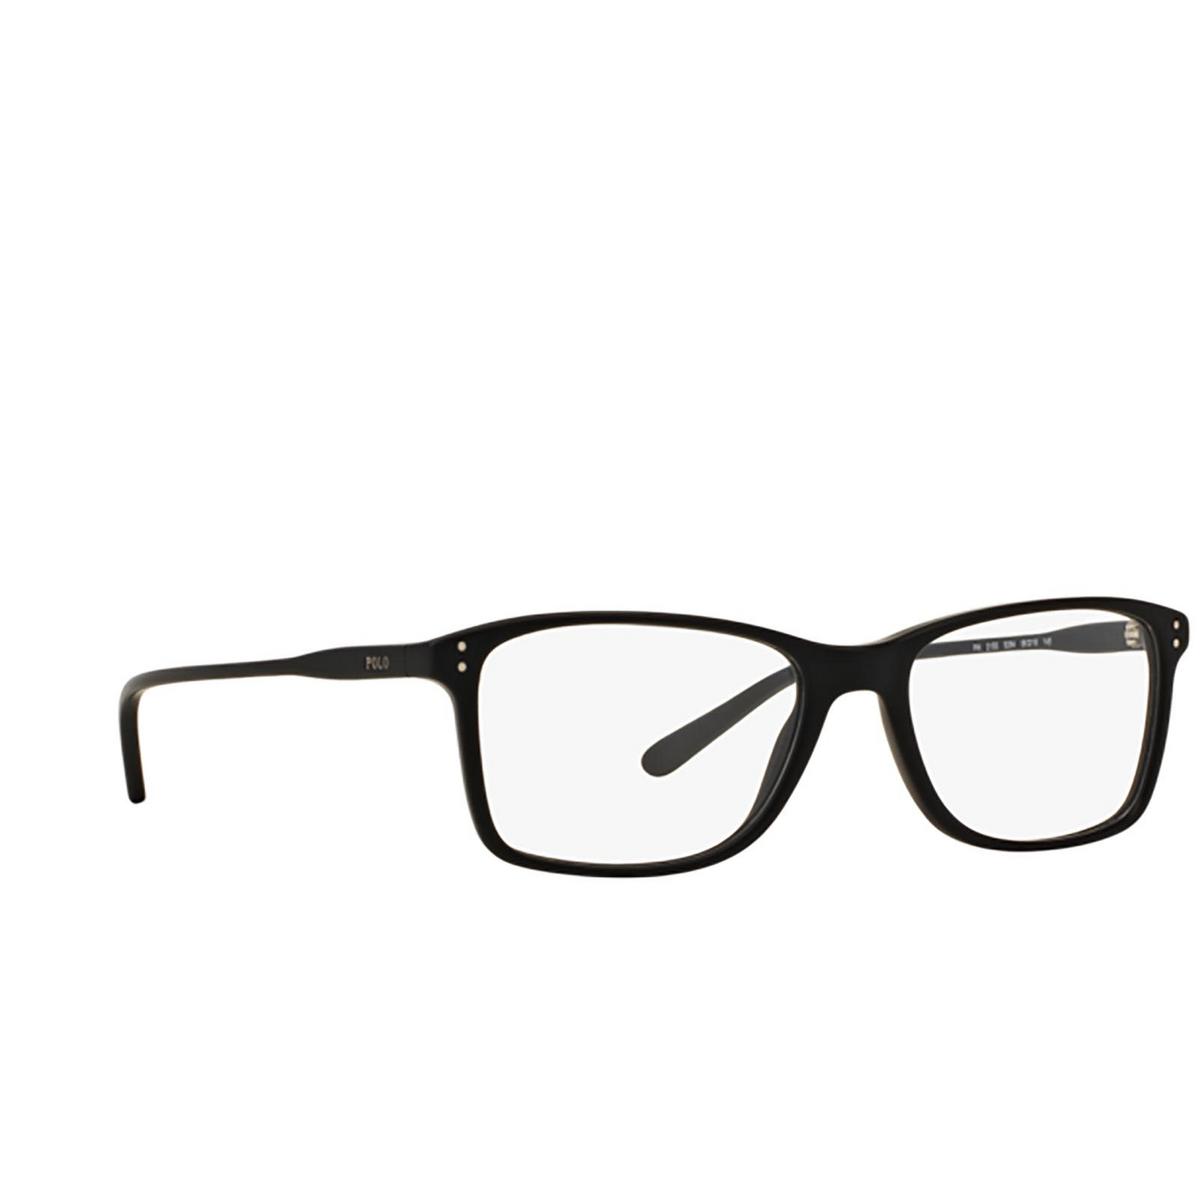 Polo Ralph Lauren® Rectangle Eyeglasses: PH2155 color Matte Black 5284 - three-quarters view.